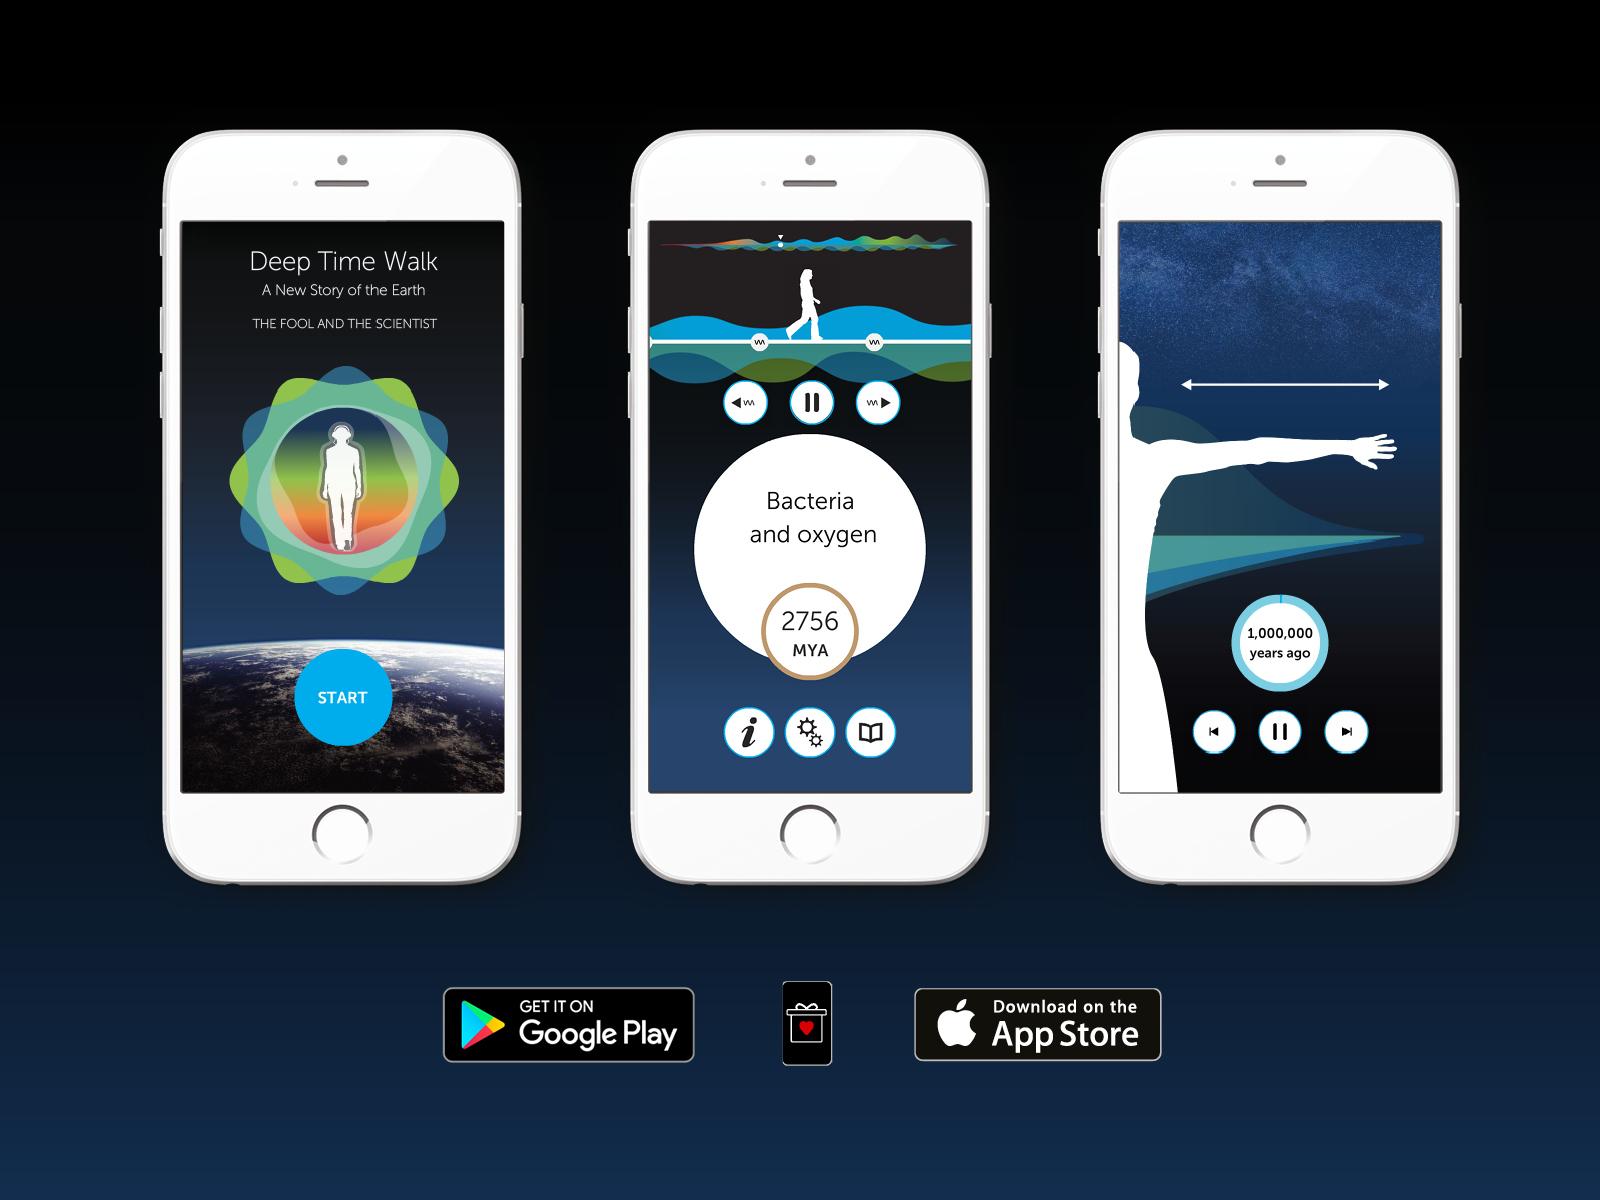 Deep Time Walk App